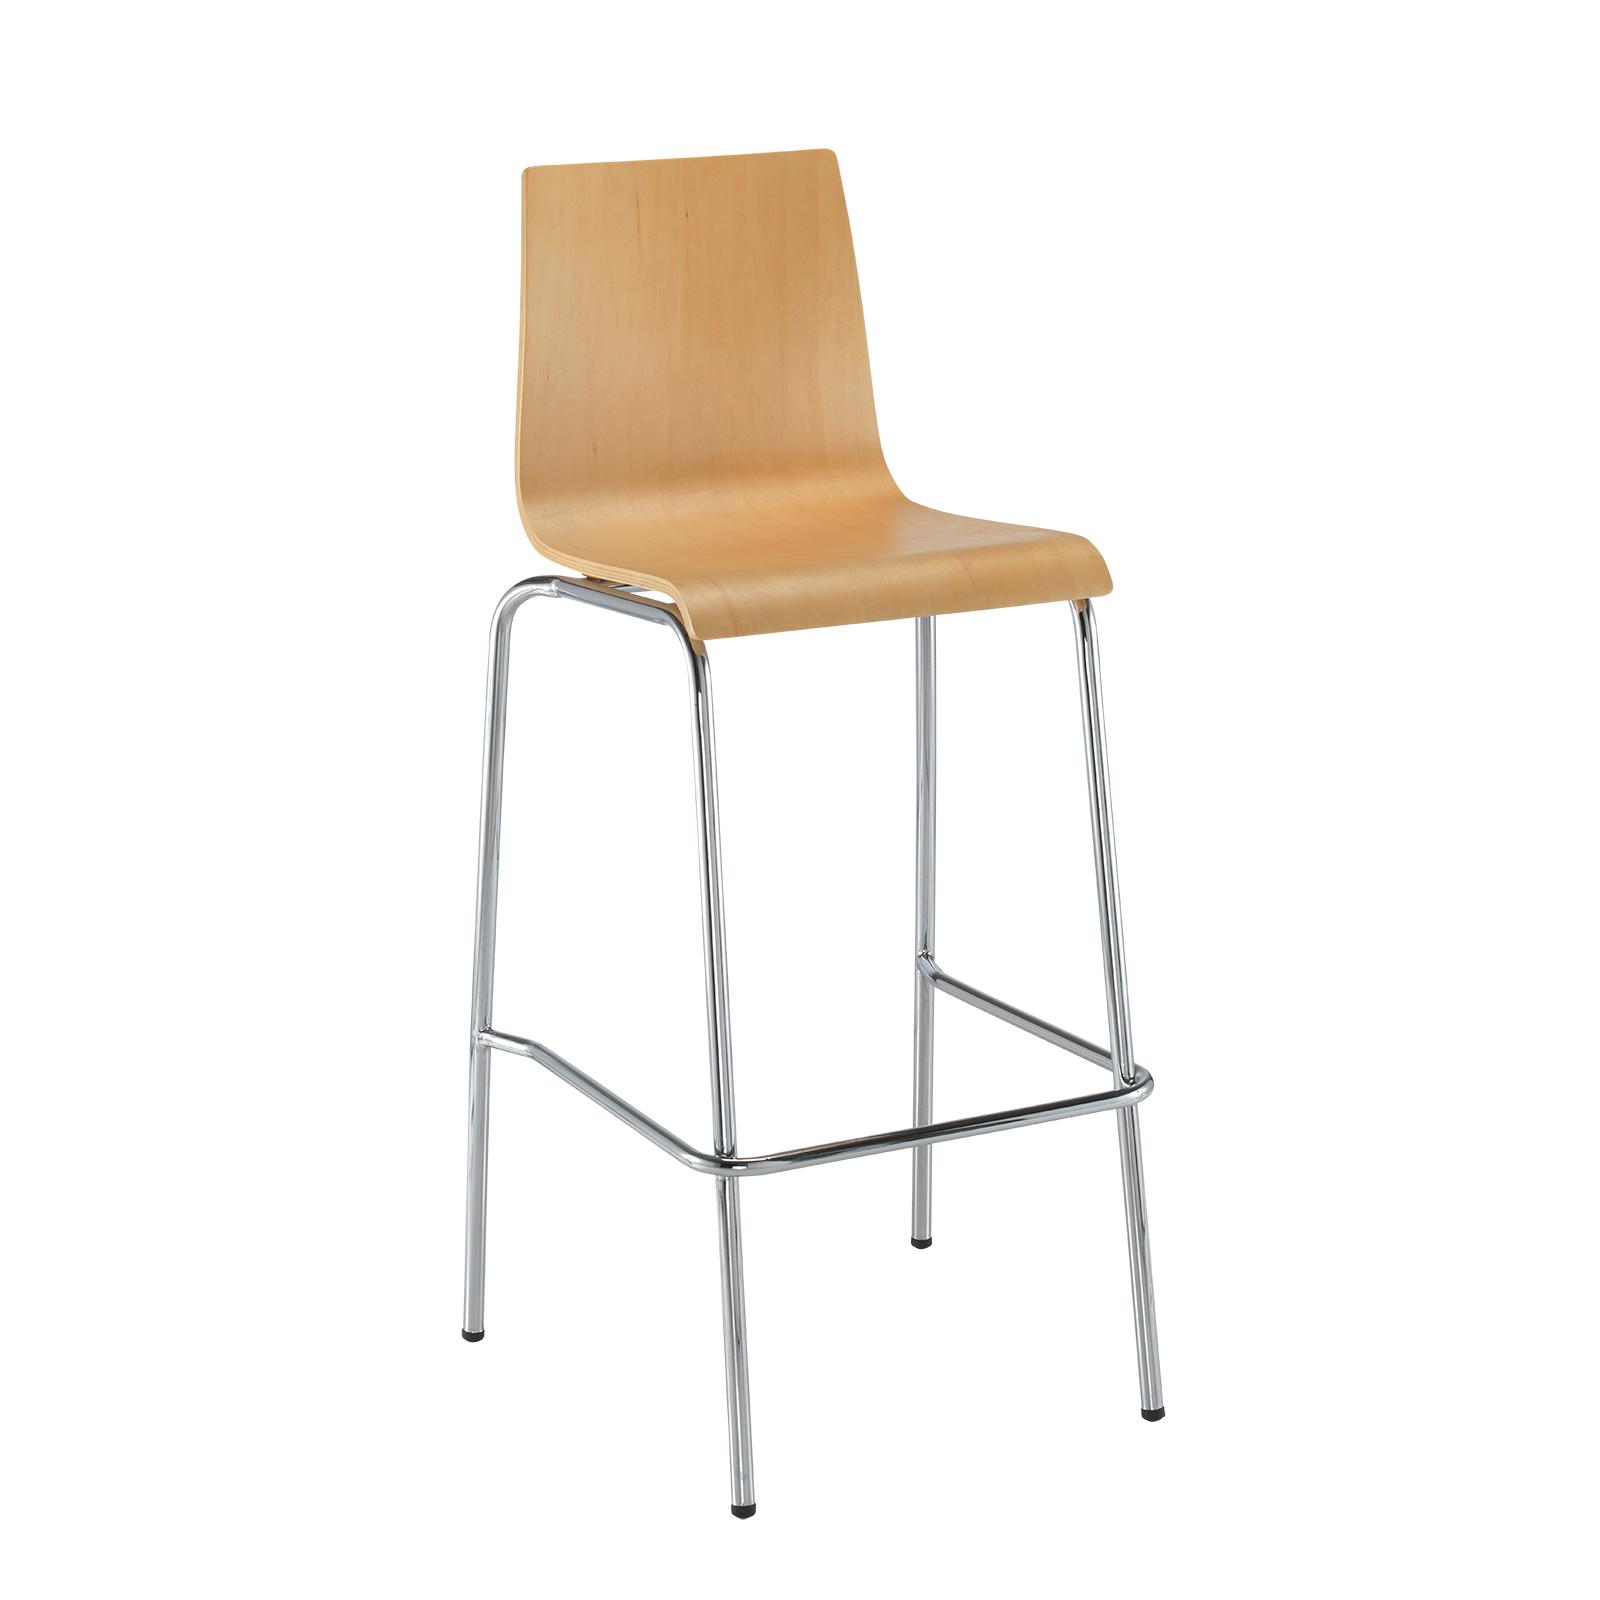 Fundamental dining stool